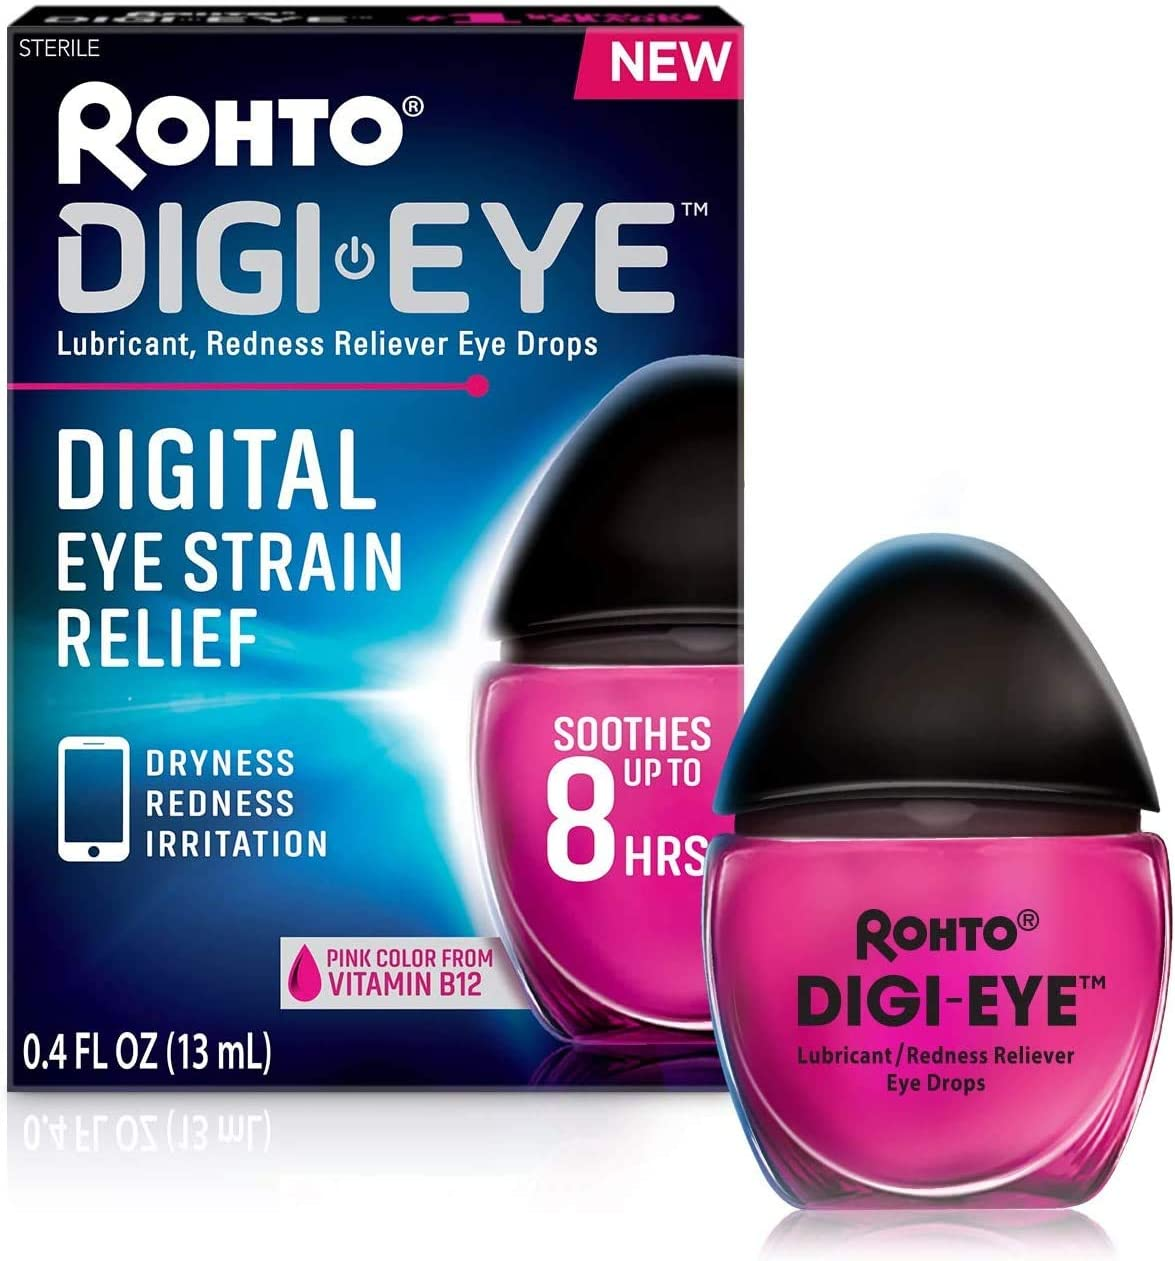 Rohto Digi-Eye Cooling Eye Drops for Digital Eye Strain, 0.4 Ounces (13 milliliters), 2 Count